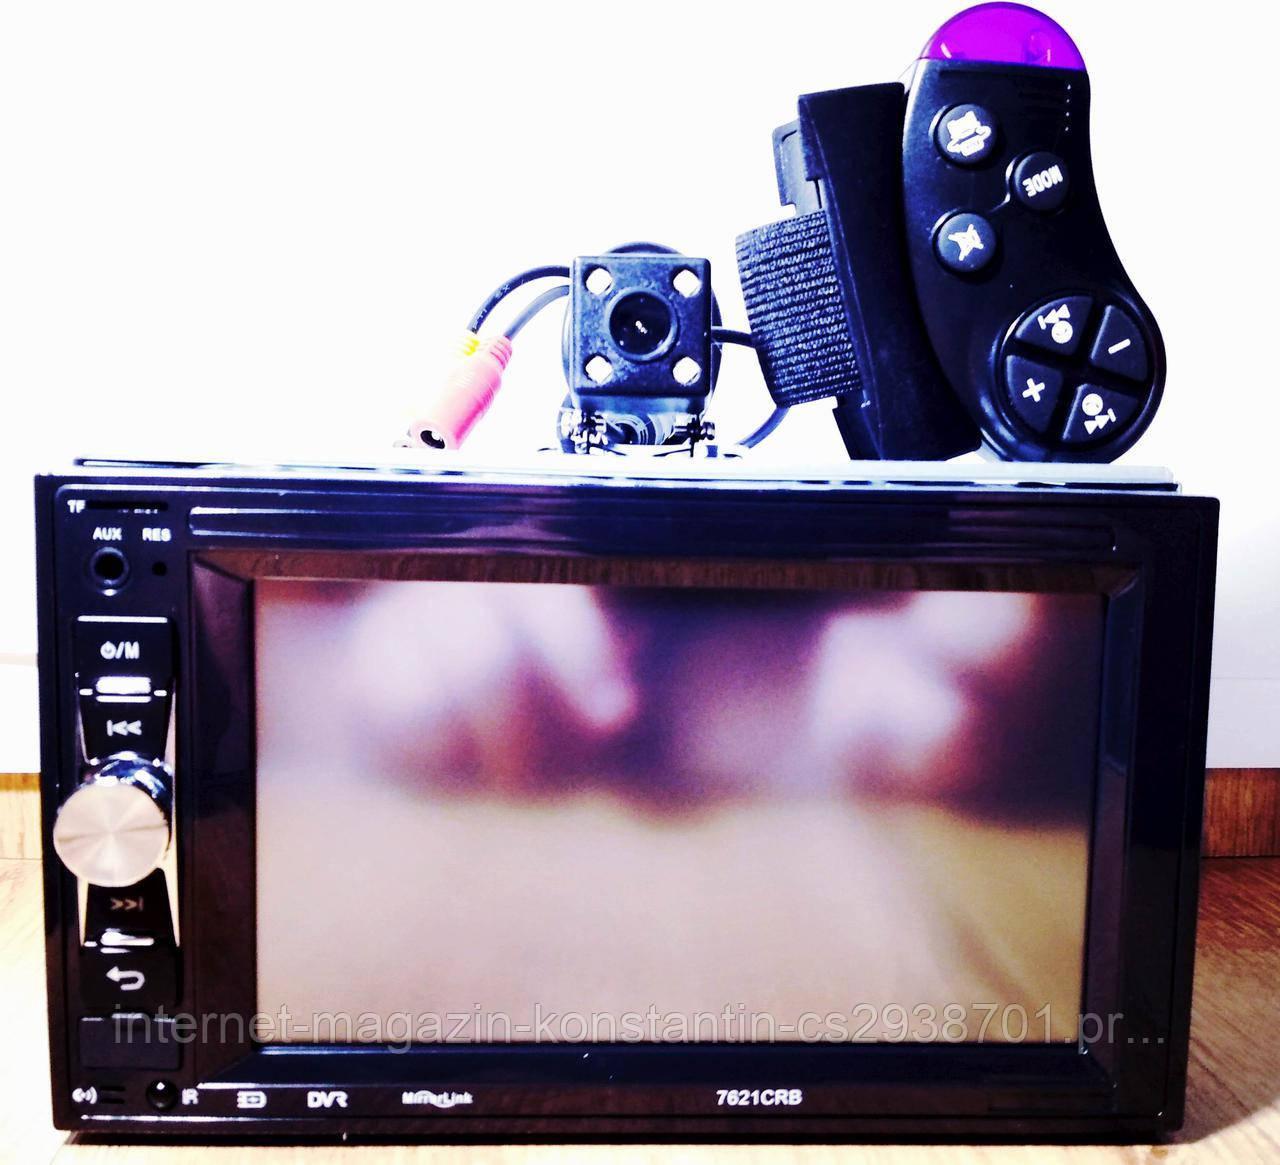 Автомагнитола 2Din Pioneer 7621CRB 1026*600px, USB,SD, Video + ПУЛЬТ НА РУЛЬ+КАМЕРА!